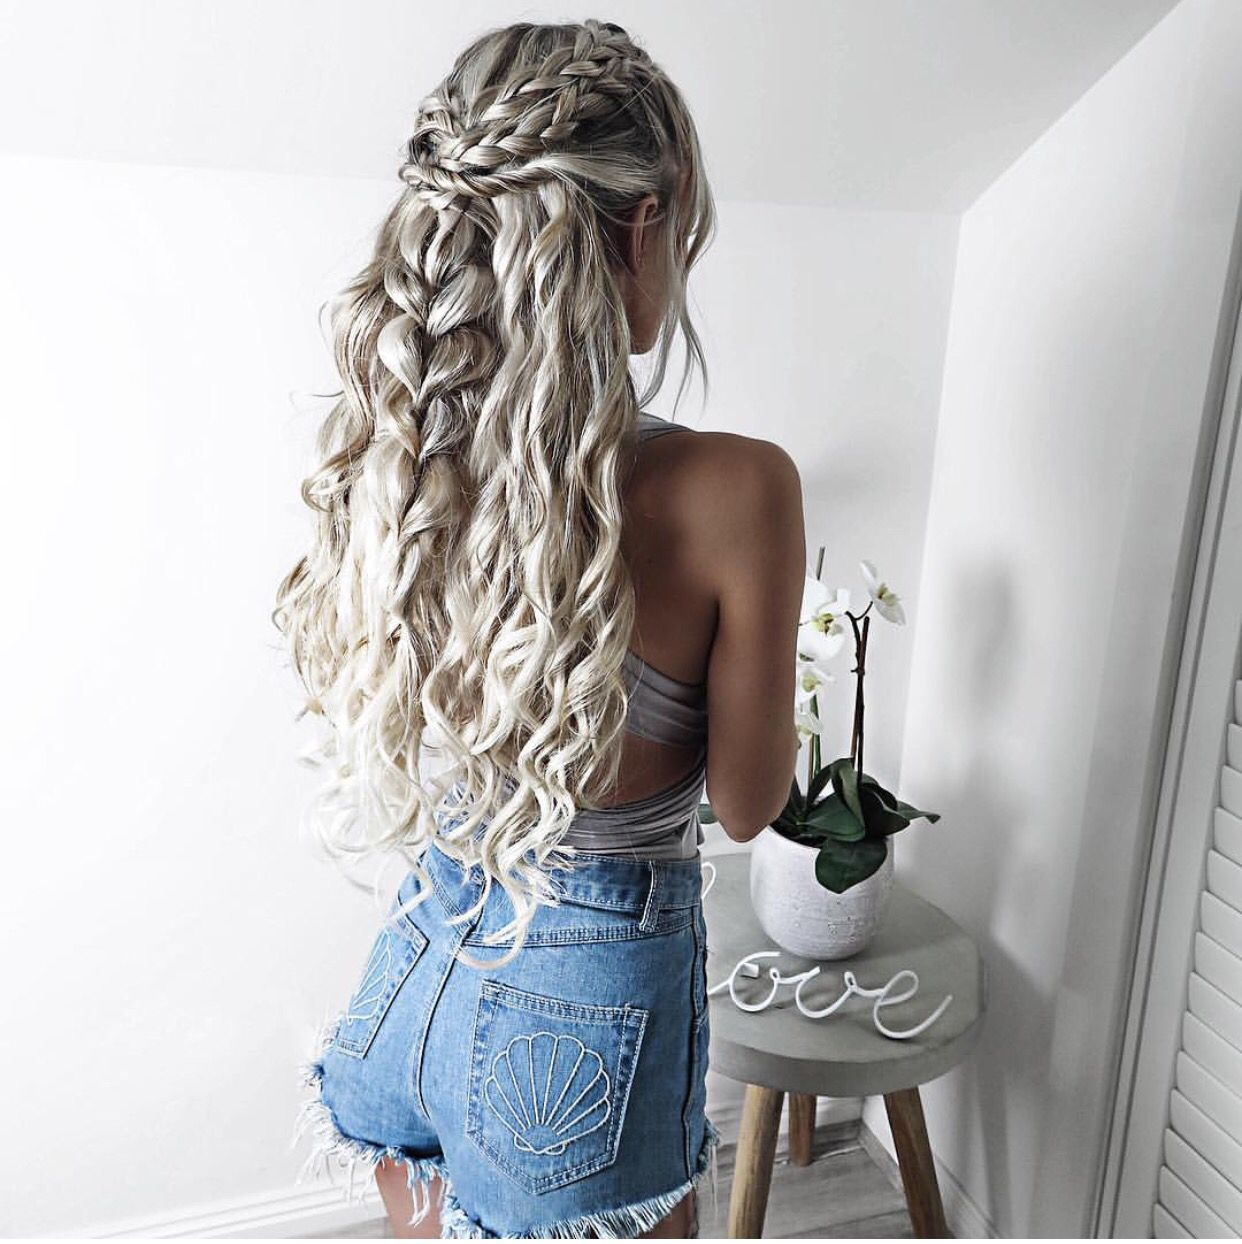 Pin by brianna tafflock on hair pinterest hair hair styles and